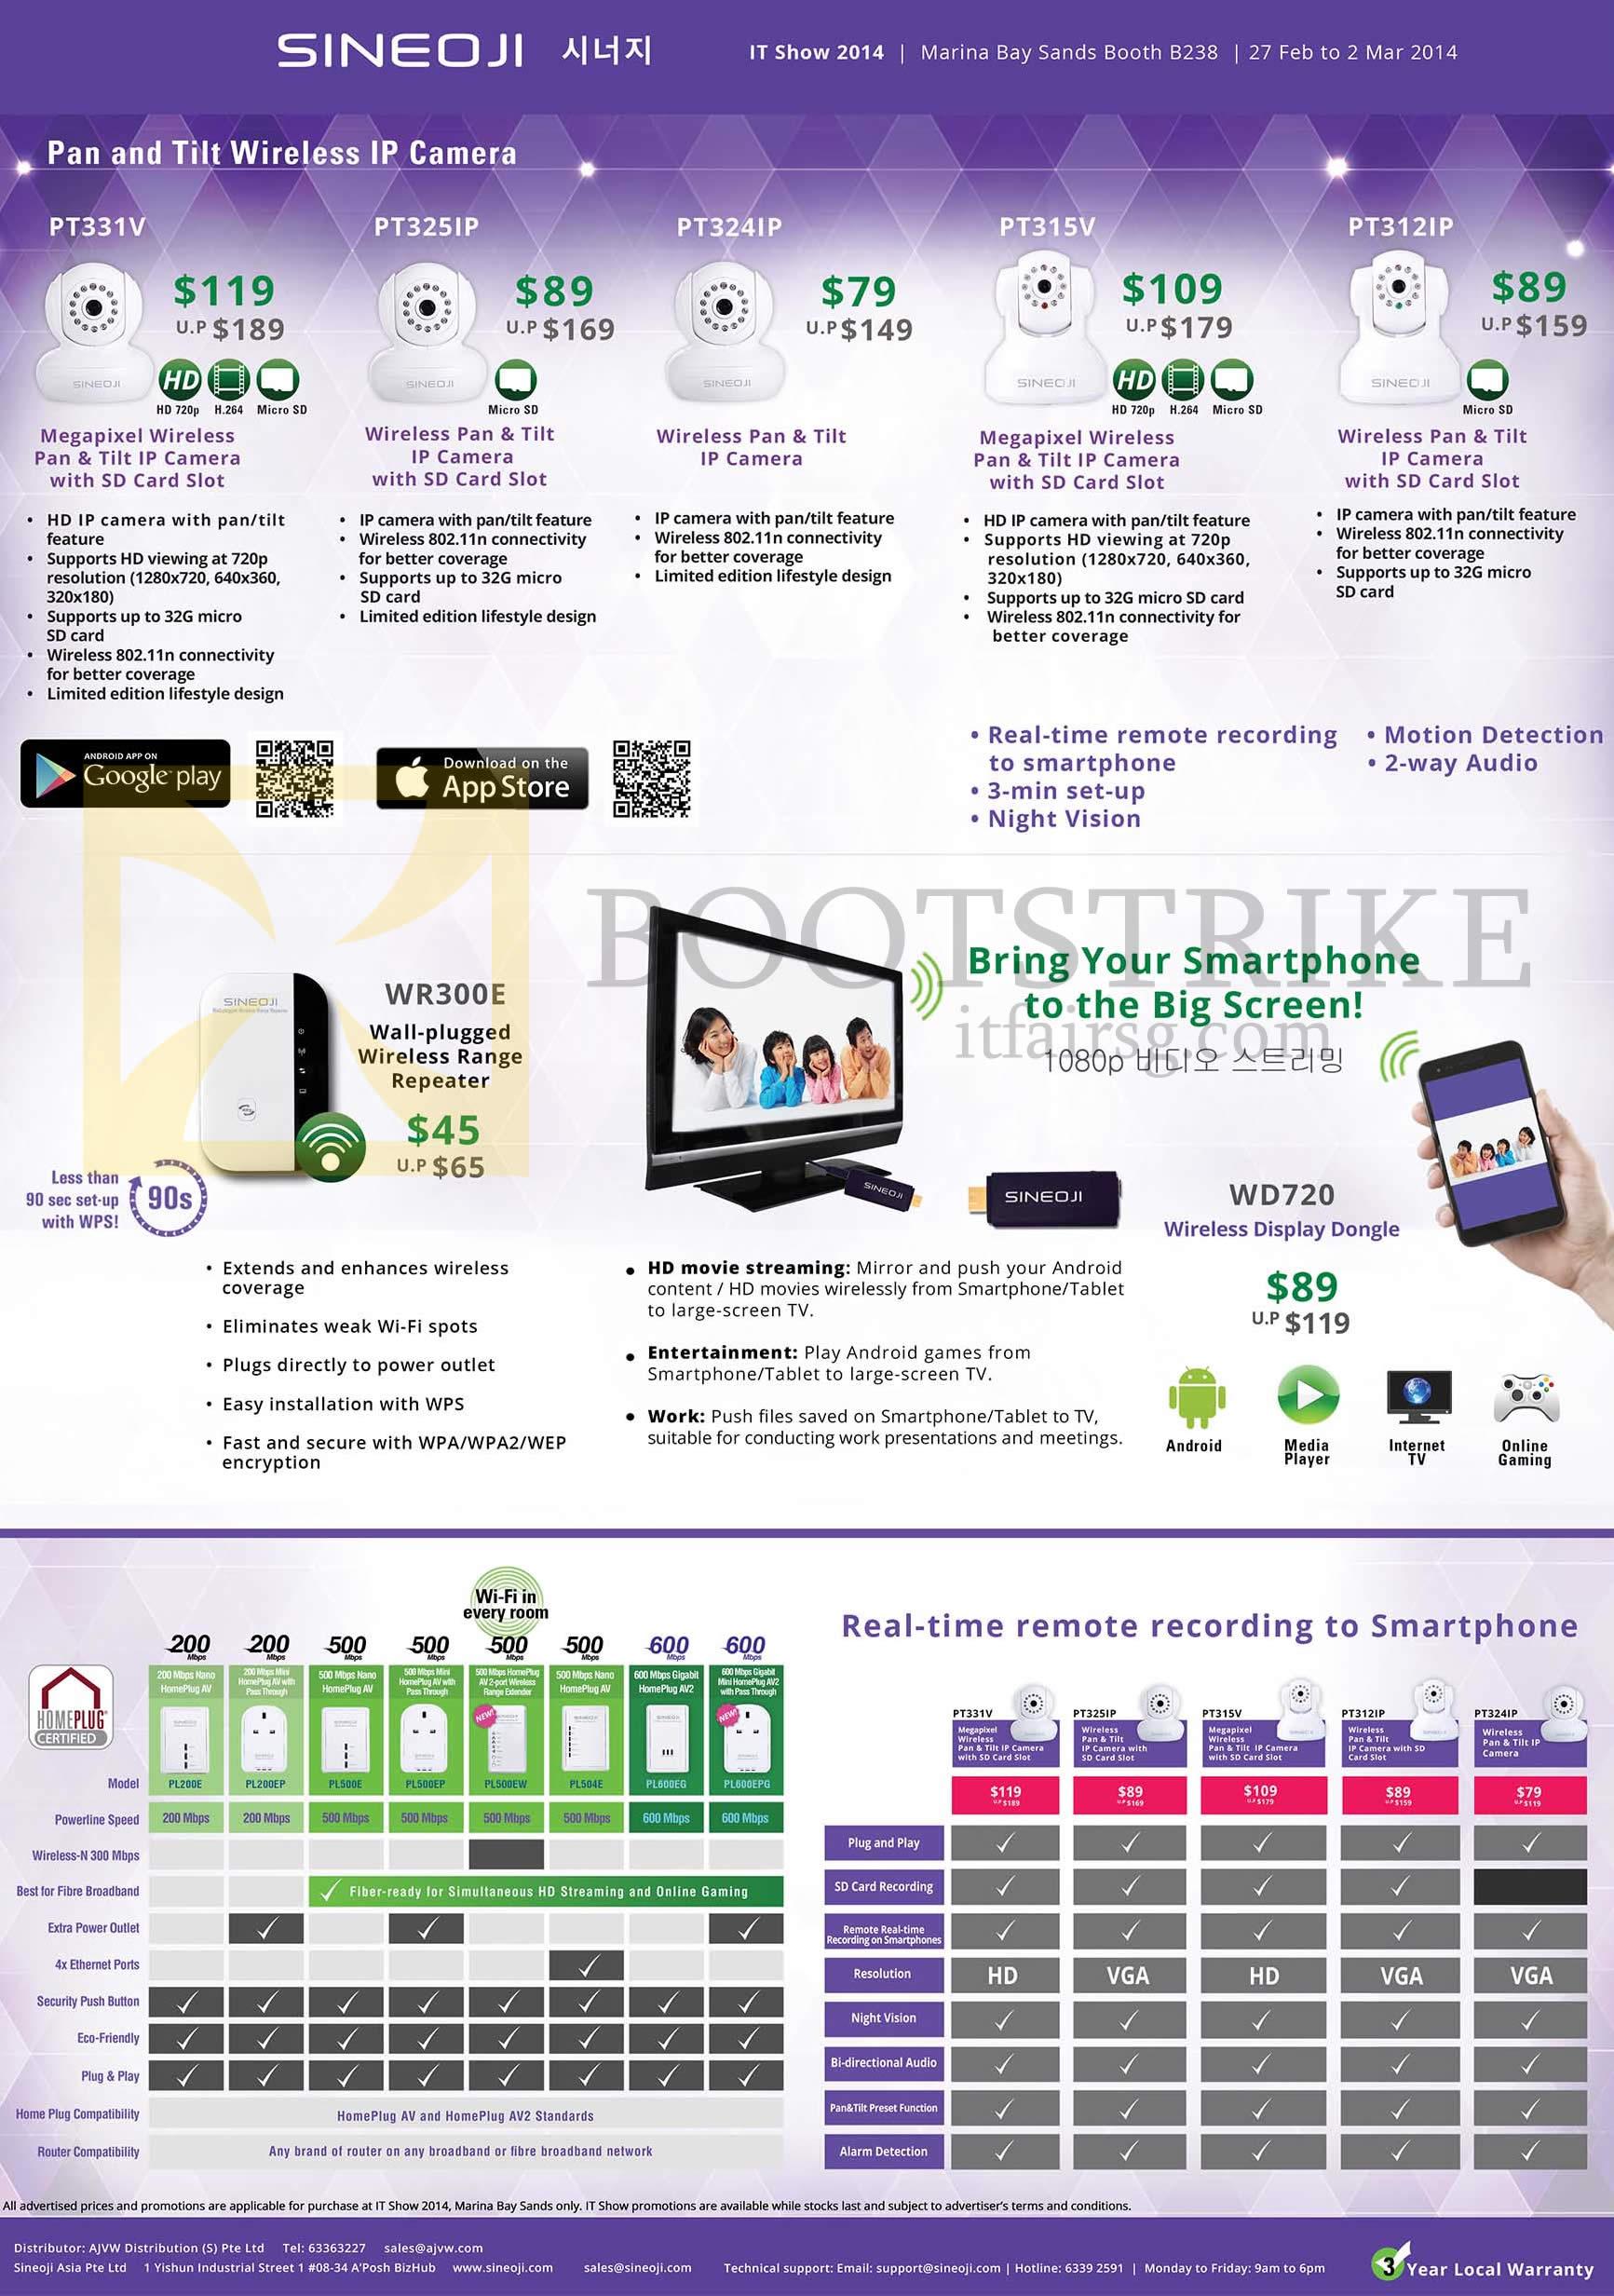 IT SHOW 2014 price list image brochure of Sineoji Networking IPCam Cameras, Wireless Repeater, HomePlug, PT331V PT325IP, PT324IP, PT315V, PT312IP, WD720